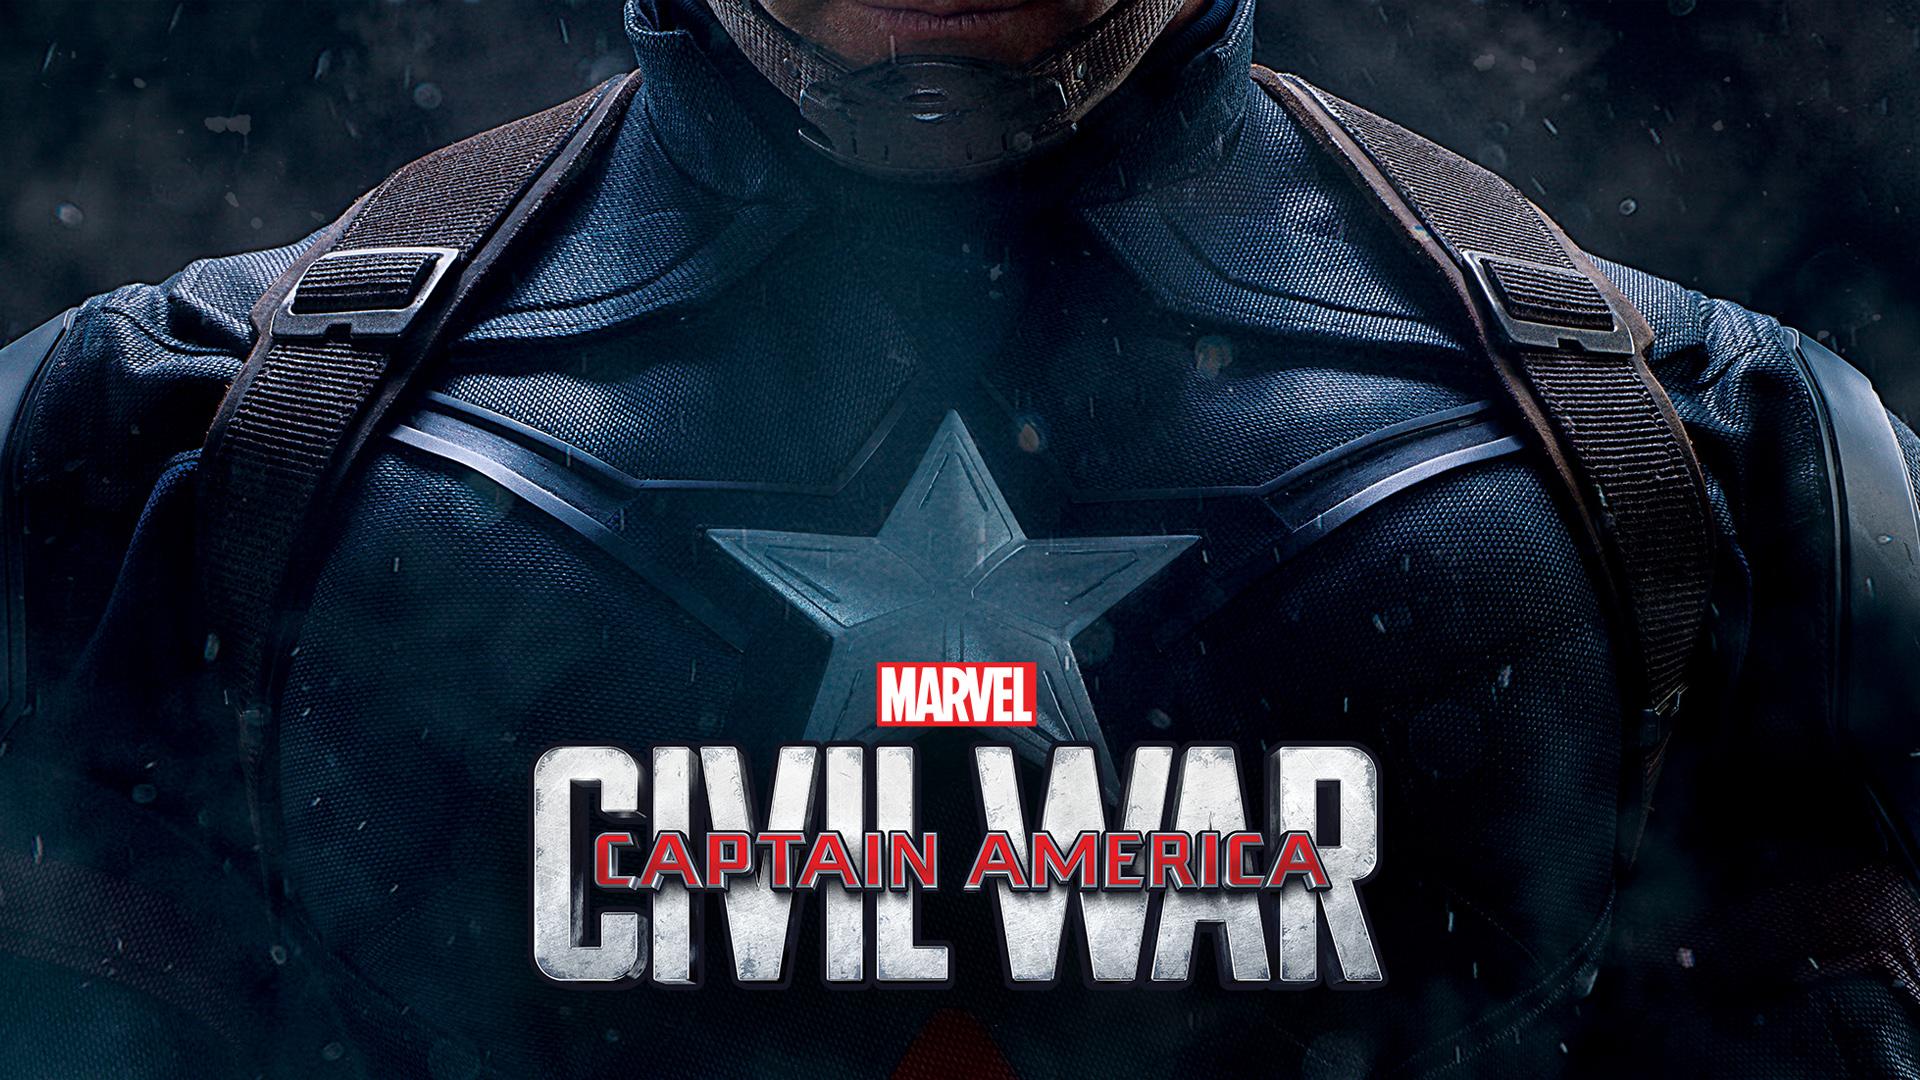 Galaxy S4 Fall Wallpaper Captain America Civil War 2016 Hd Wallpaper